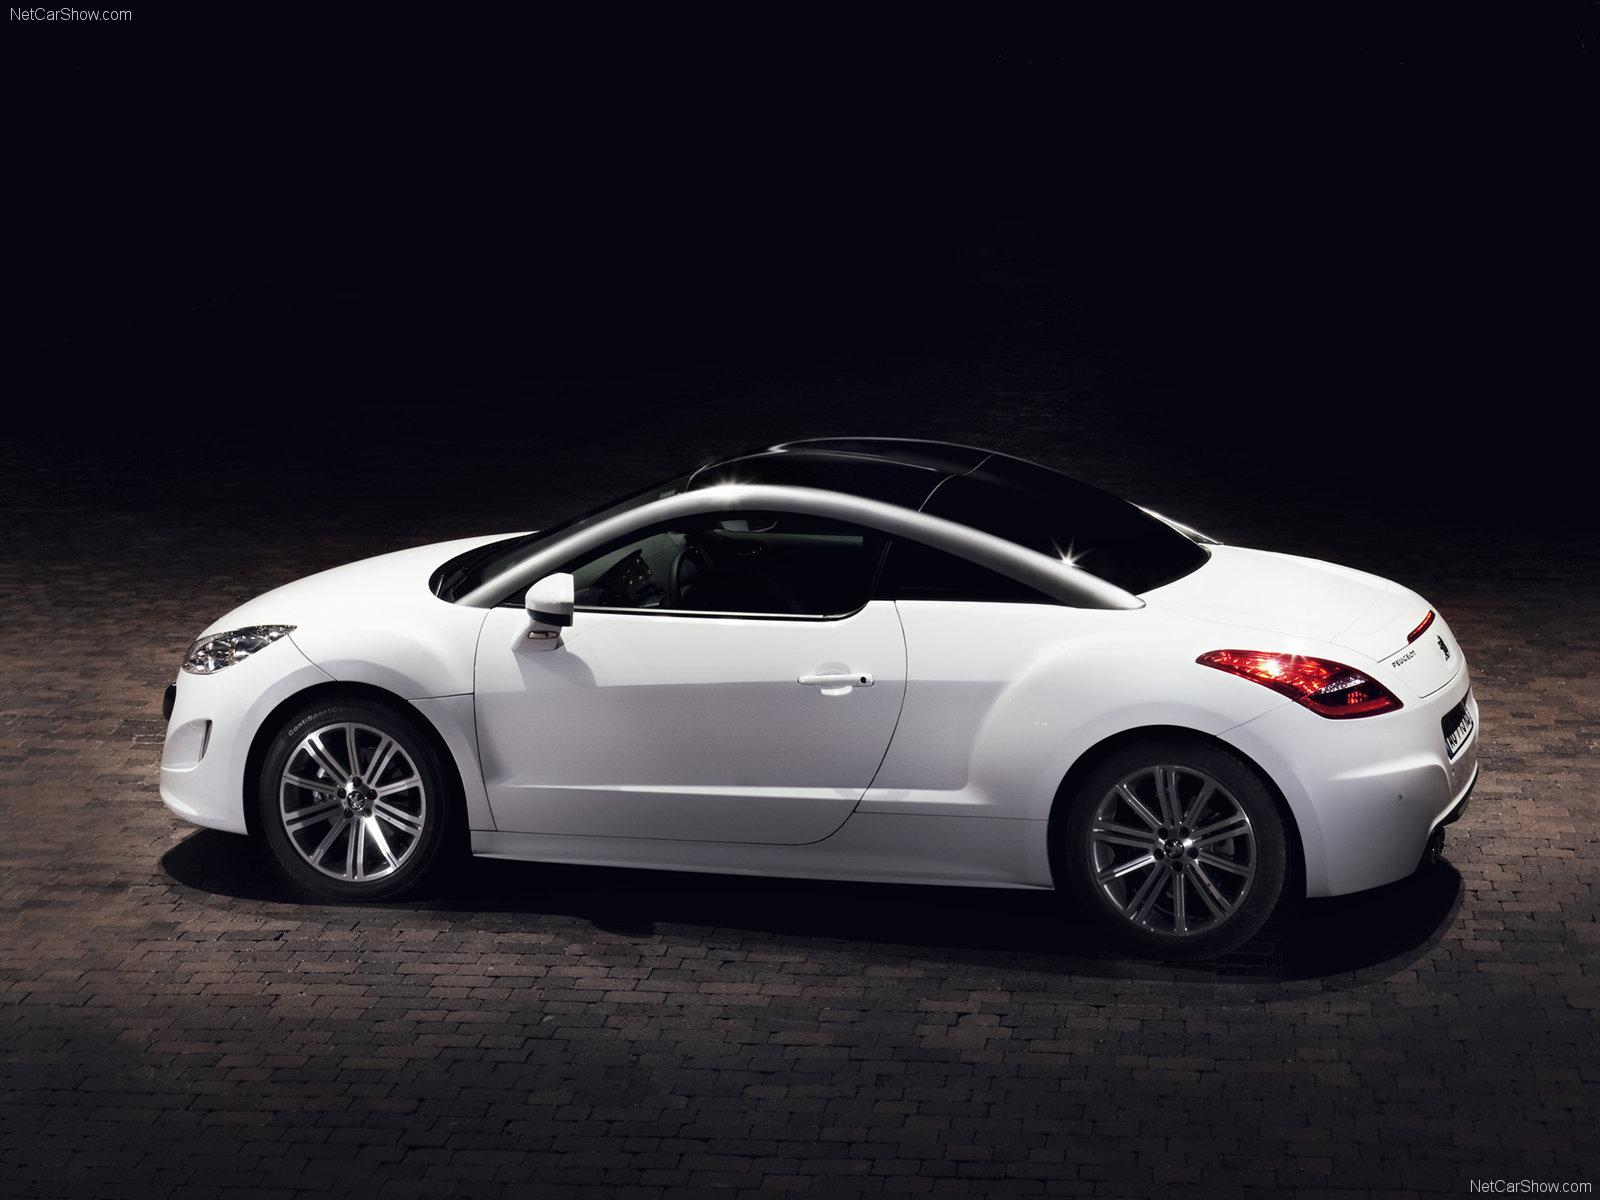 http://1.bp.blogspot.com/-okPBanHK7hI/UF0yE55_GkI/AAAAAAAAARc/7mGMXpVZTcI/s1600/Peugeot-RCZ_mp40_pic_72639.jpg